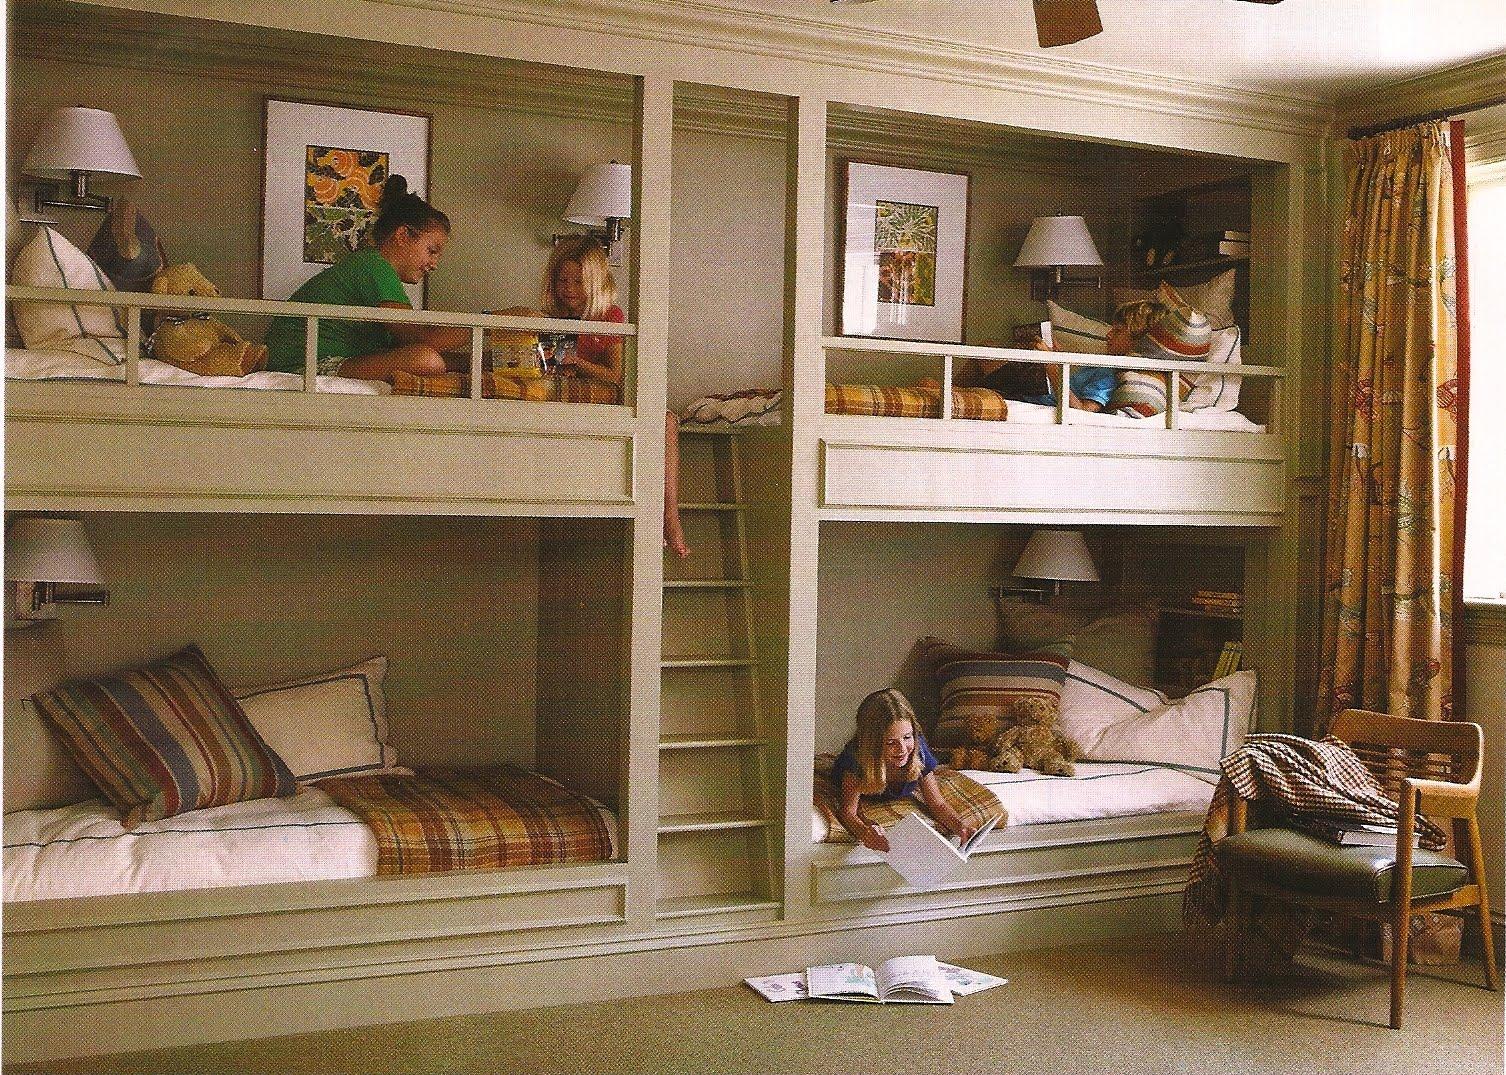 design dump: built-in beds